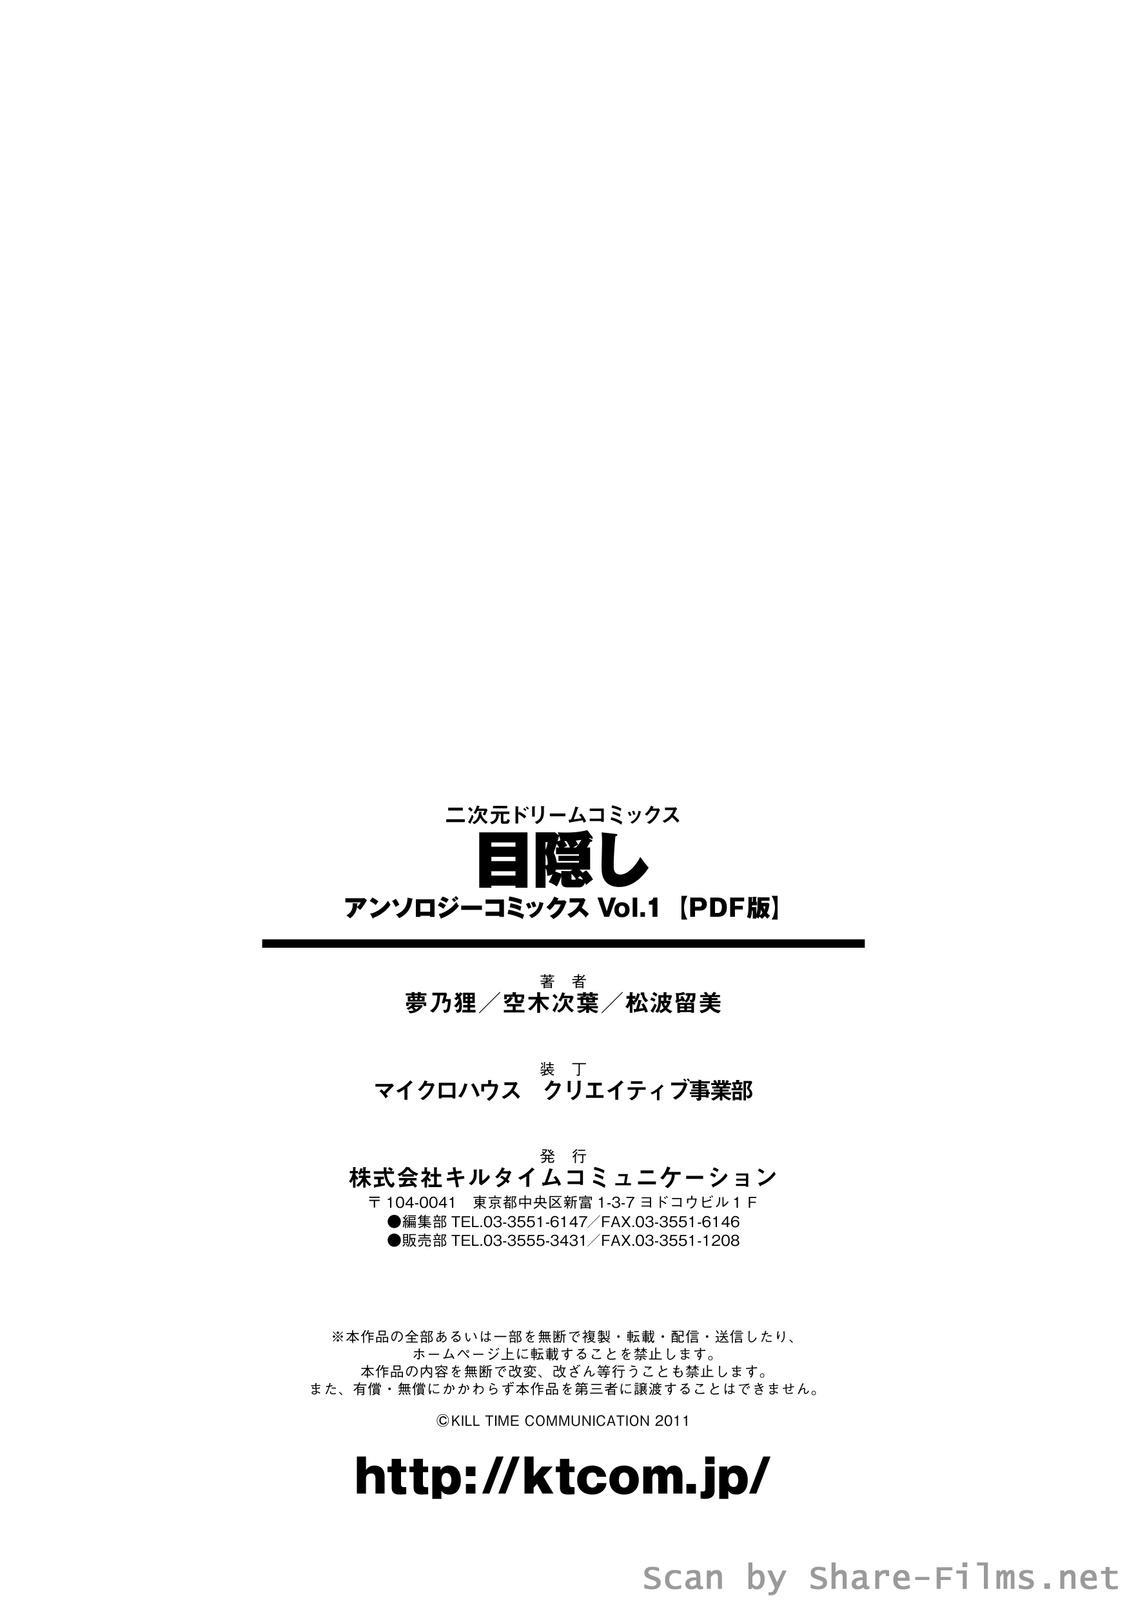 Mekakushi Anthology Comics Vol. 1 71